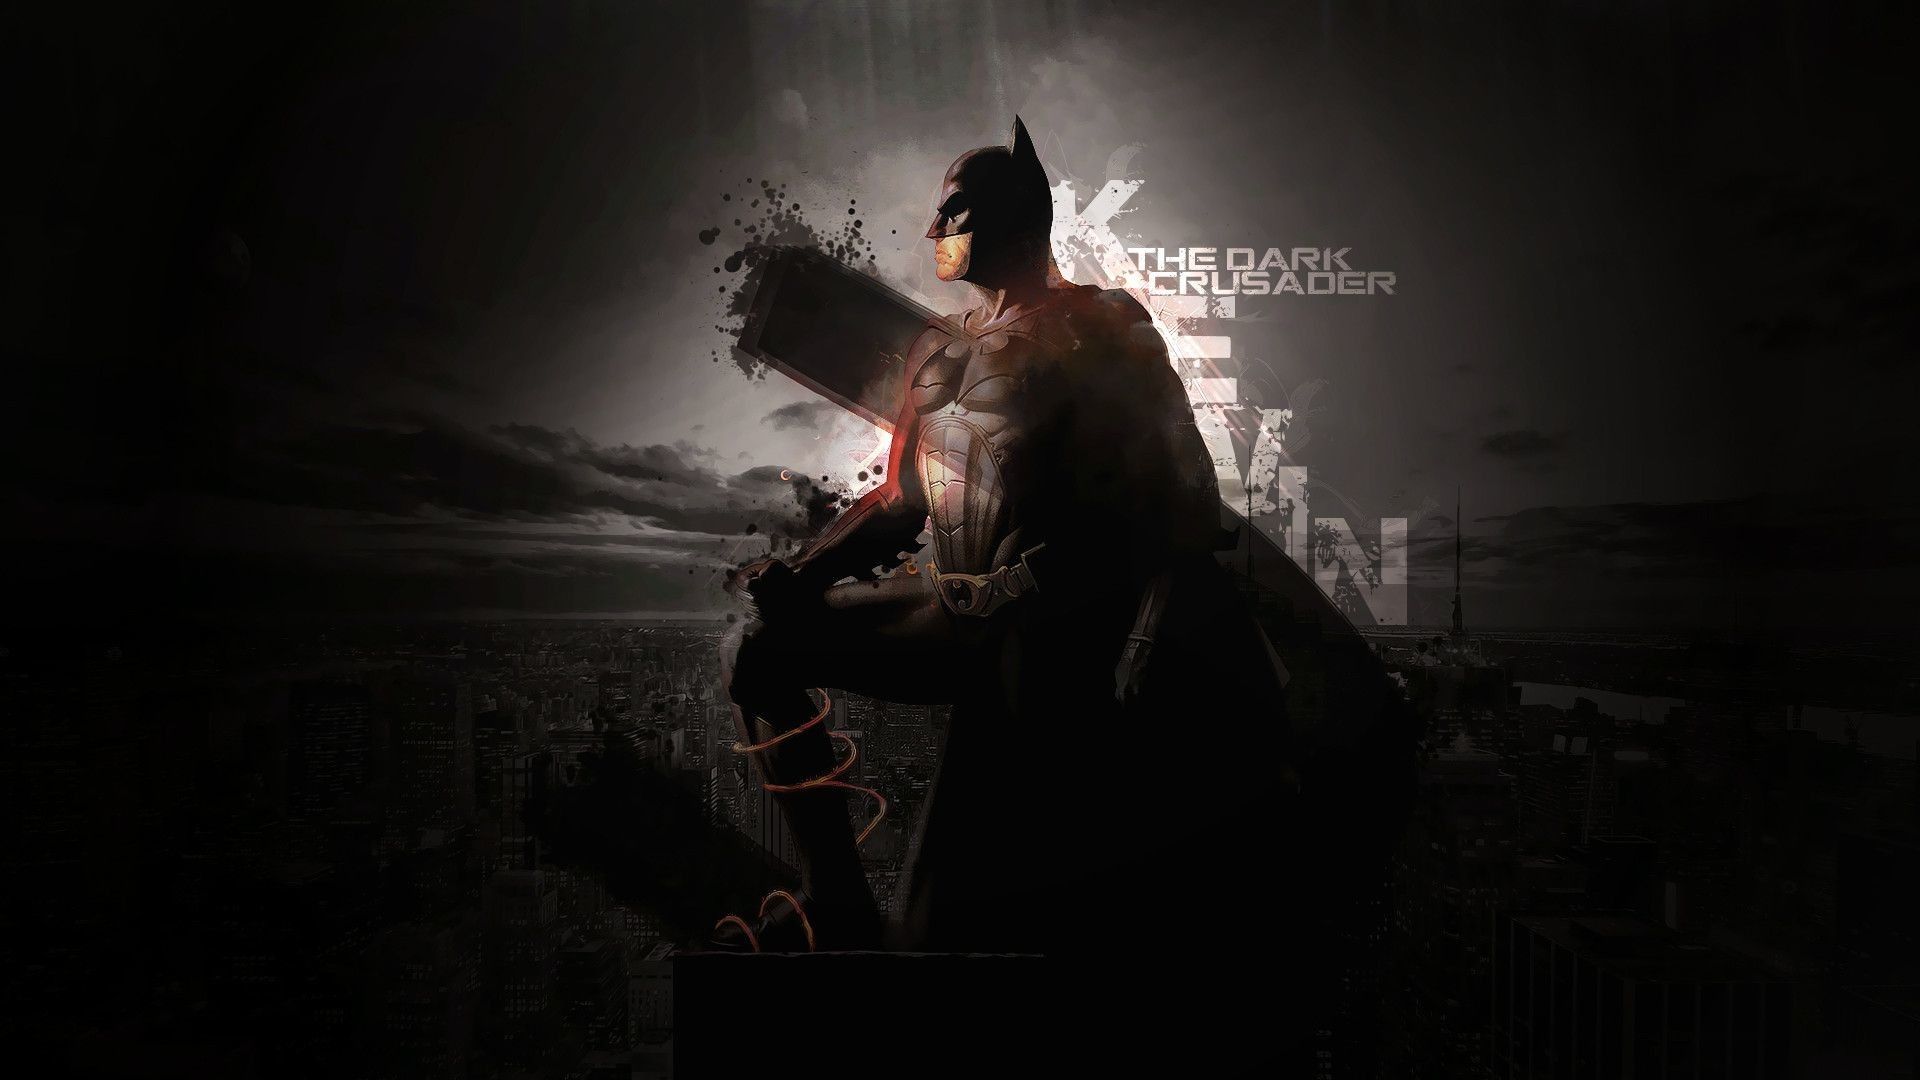 Batman Wallpaper HD download free